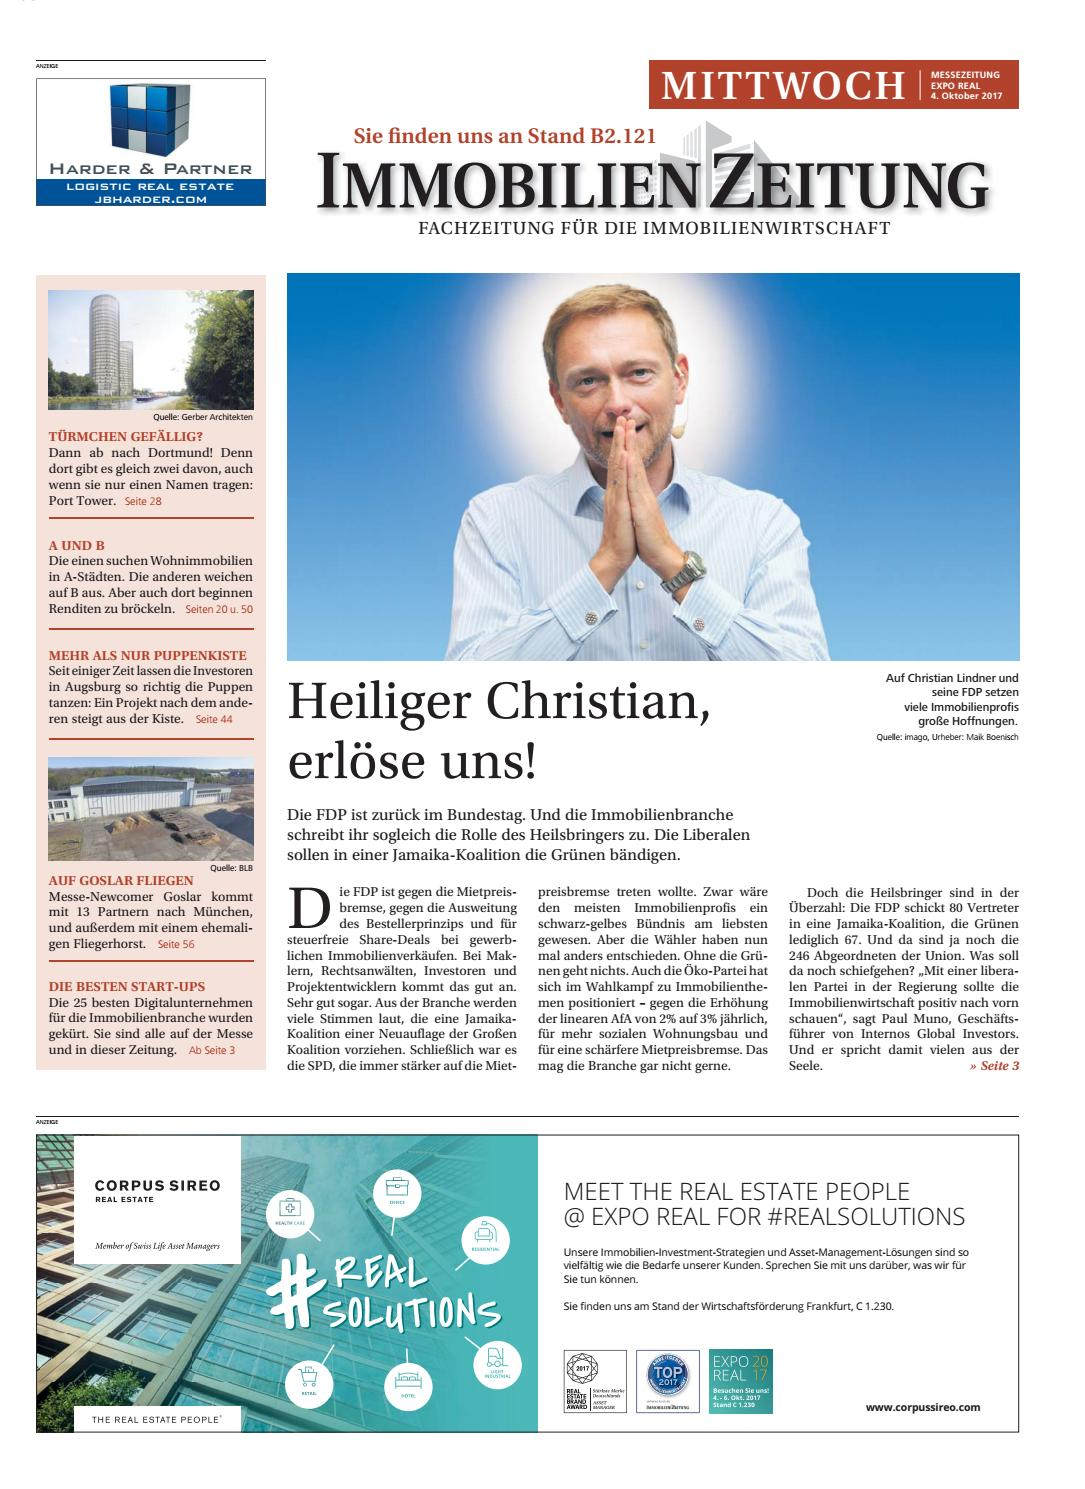 04 10 messezeitung by Immobilien Zeitung Verlagsgesellschaft mbH - issuu